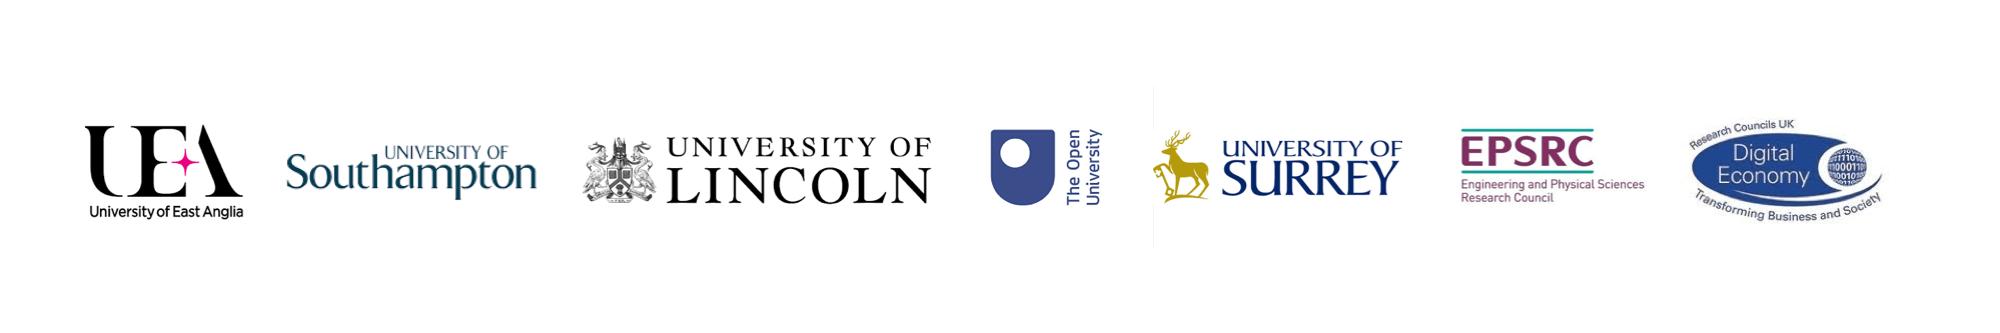 IOFT logos